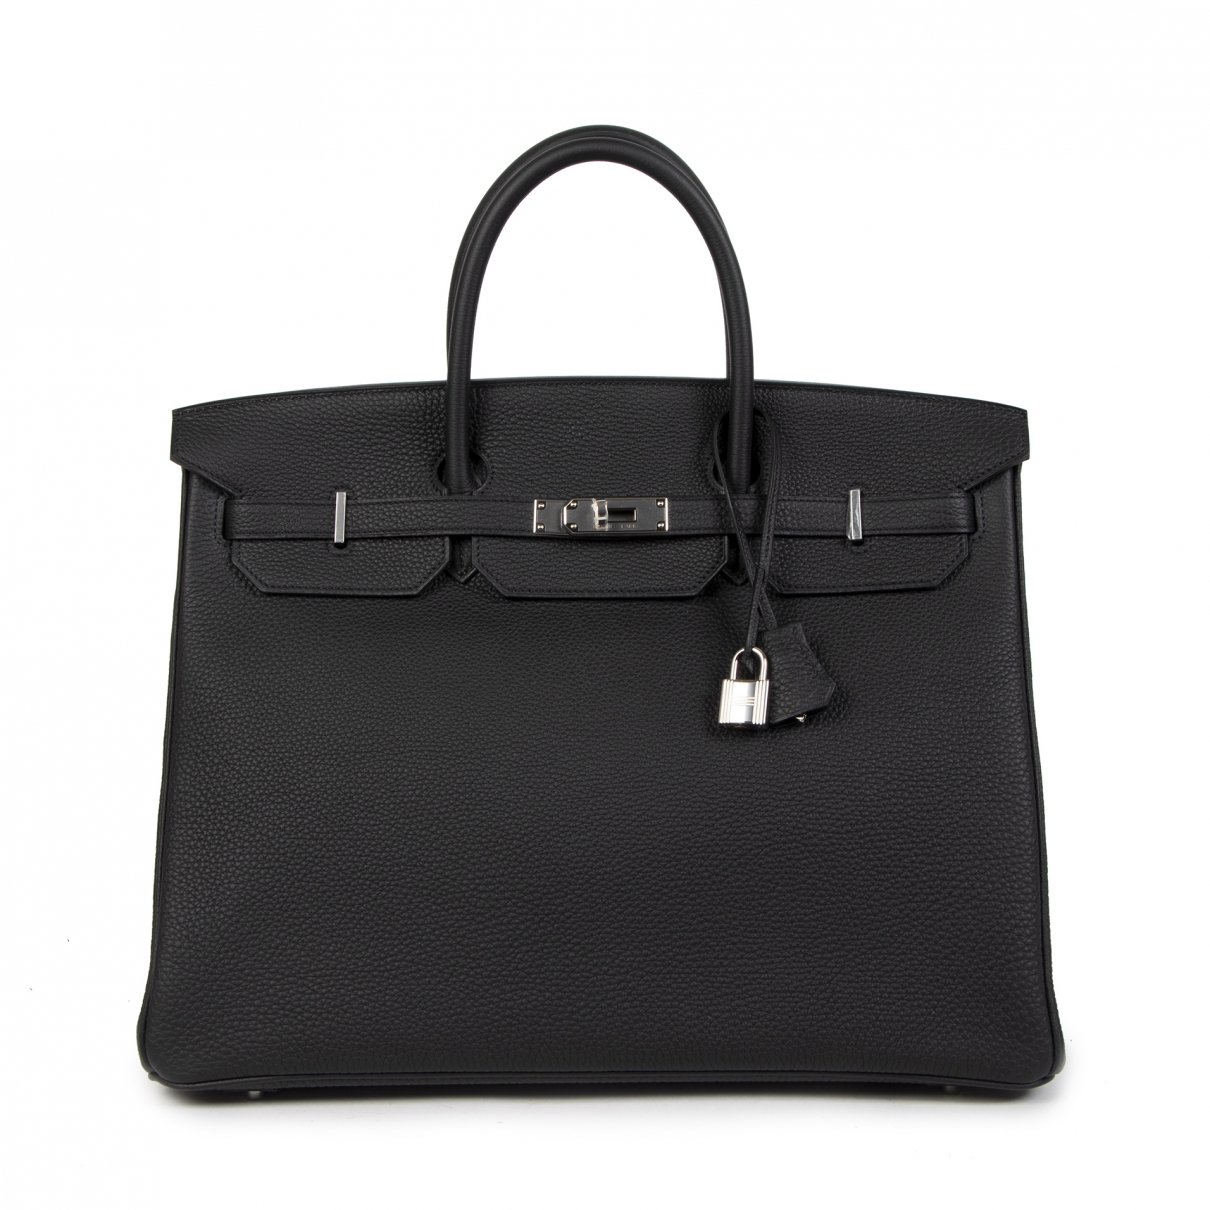 Hermes Birkin 40 Handtasche in  Schwarz Leder